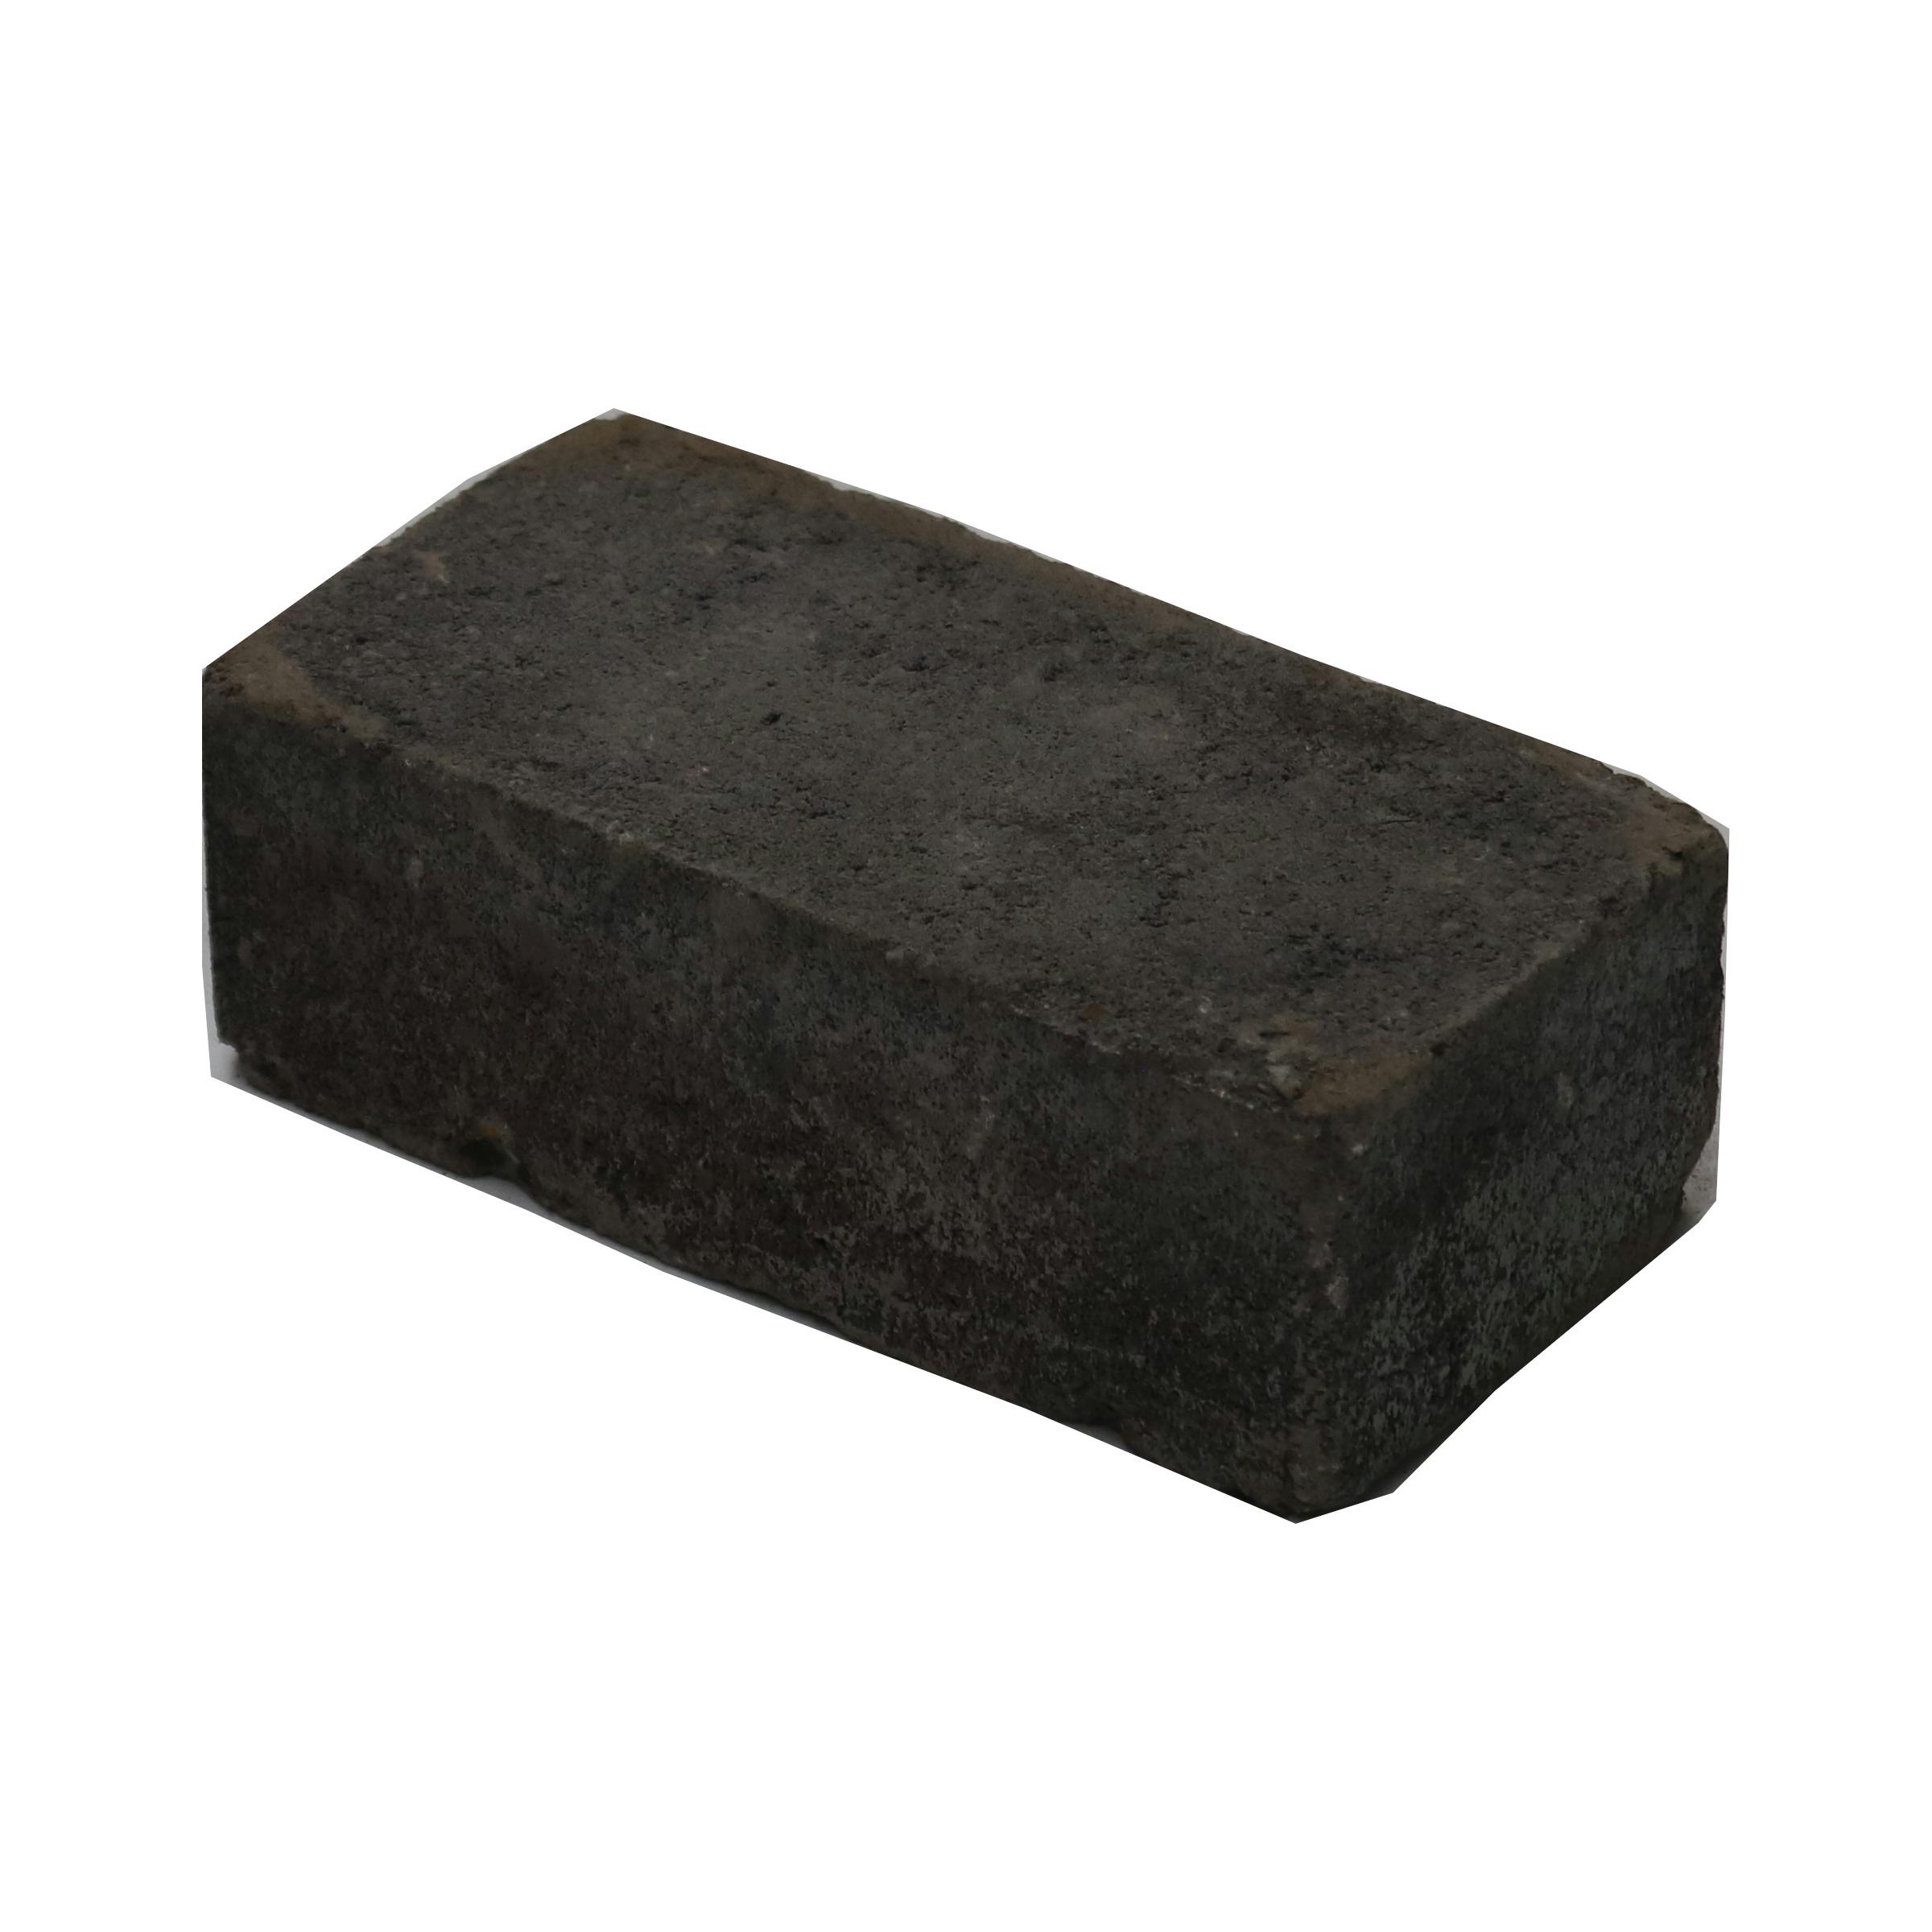 Klinker Beton Getrommeld Mangaan 21x10,5x7 cm - 36 Klinkers - 0,75 m2